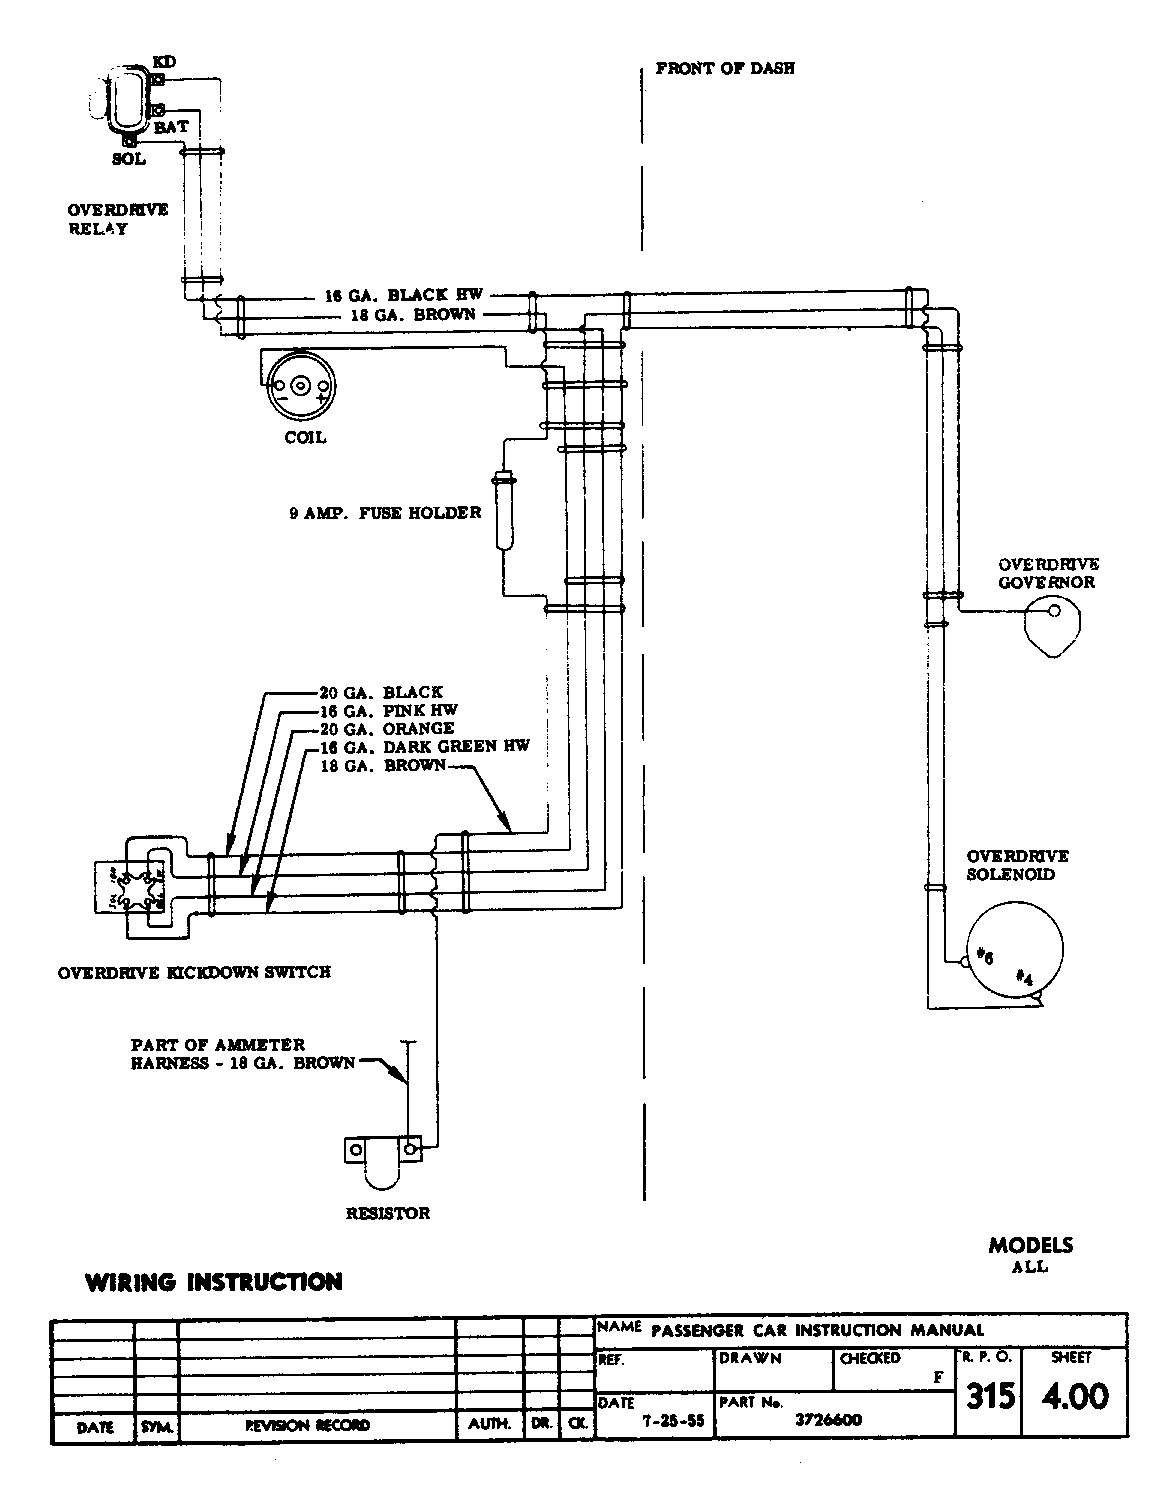 hight resolution of 1955 chevy voltage regulator wiring diagram complete wiring diagrams u2022 rh ibeegu co delco remy voltage